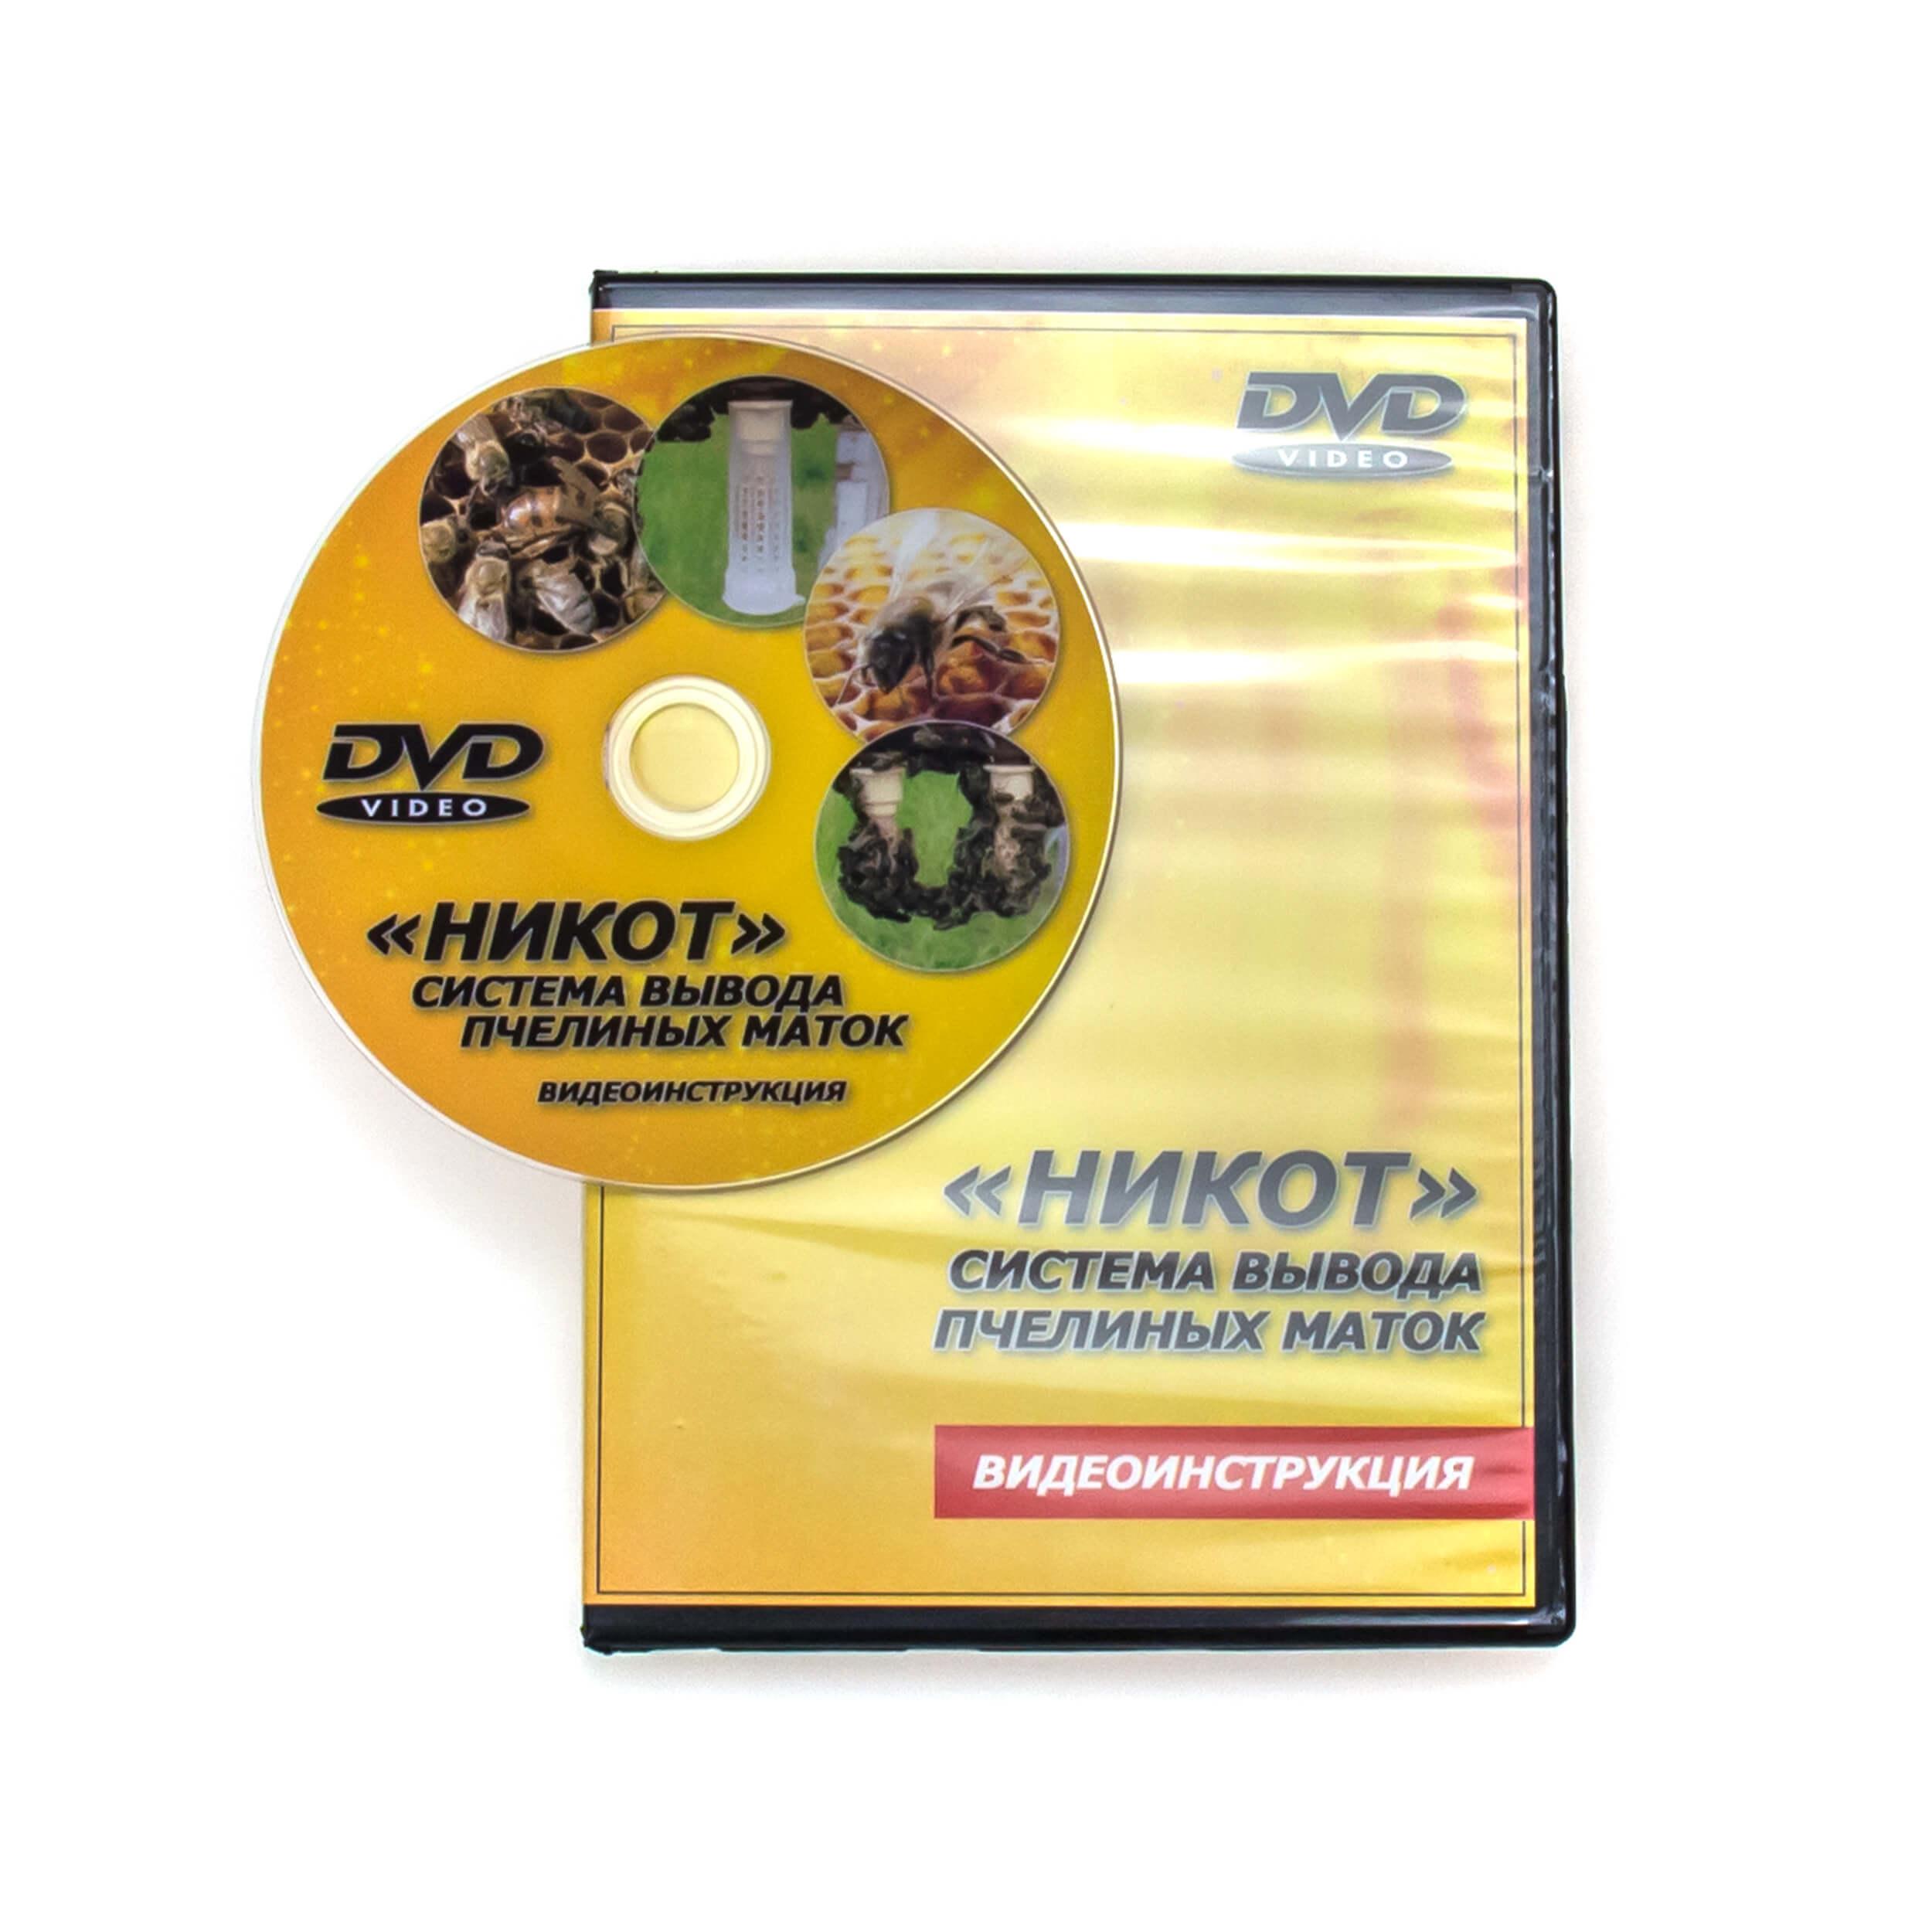 "Видео диск ""Система Никот - видеоинструкция"" фото"